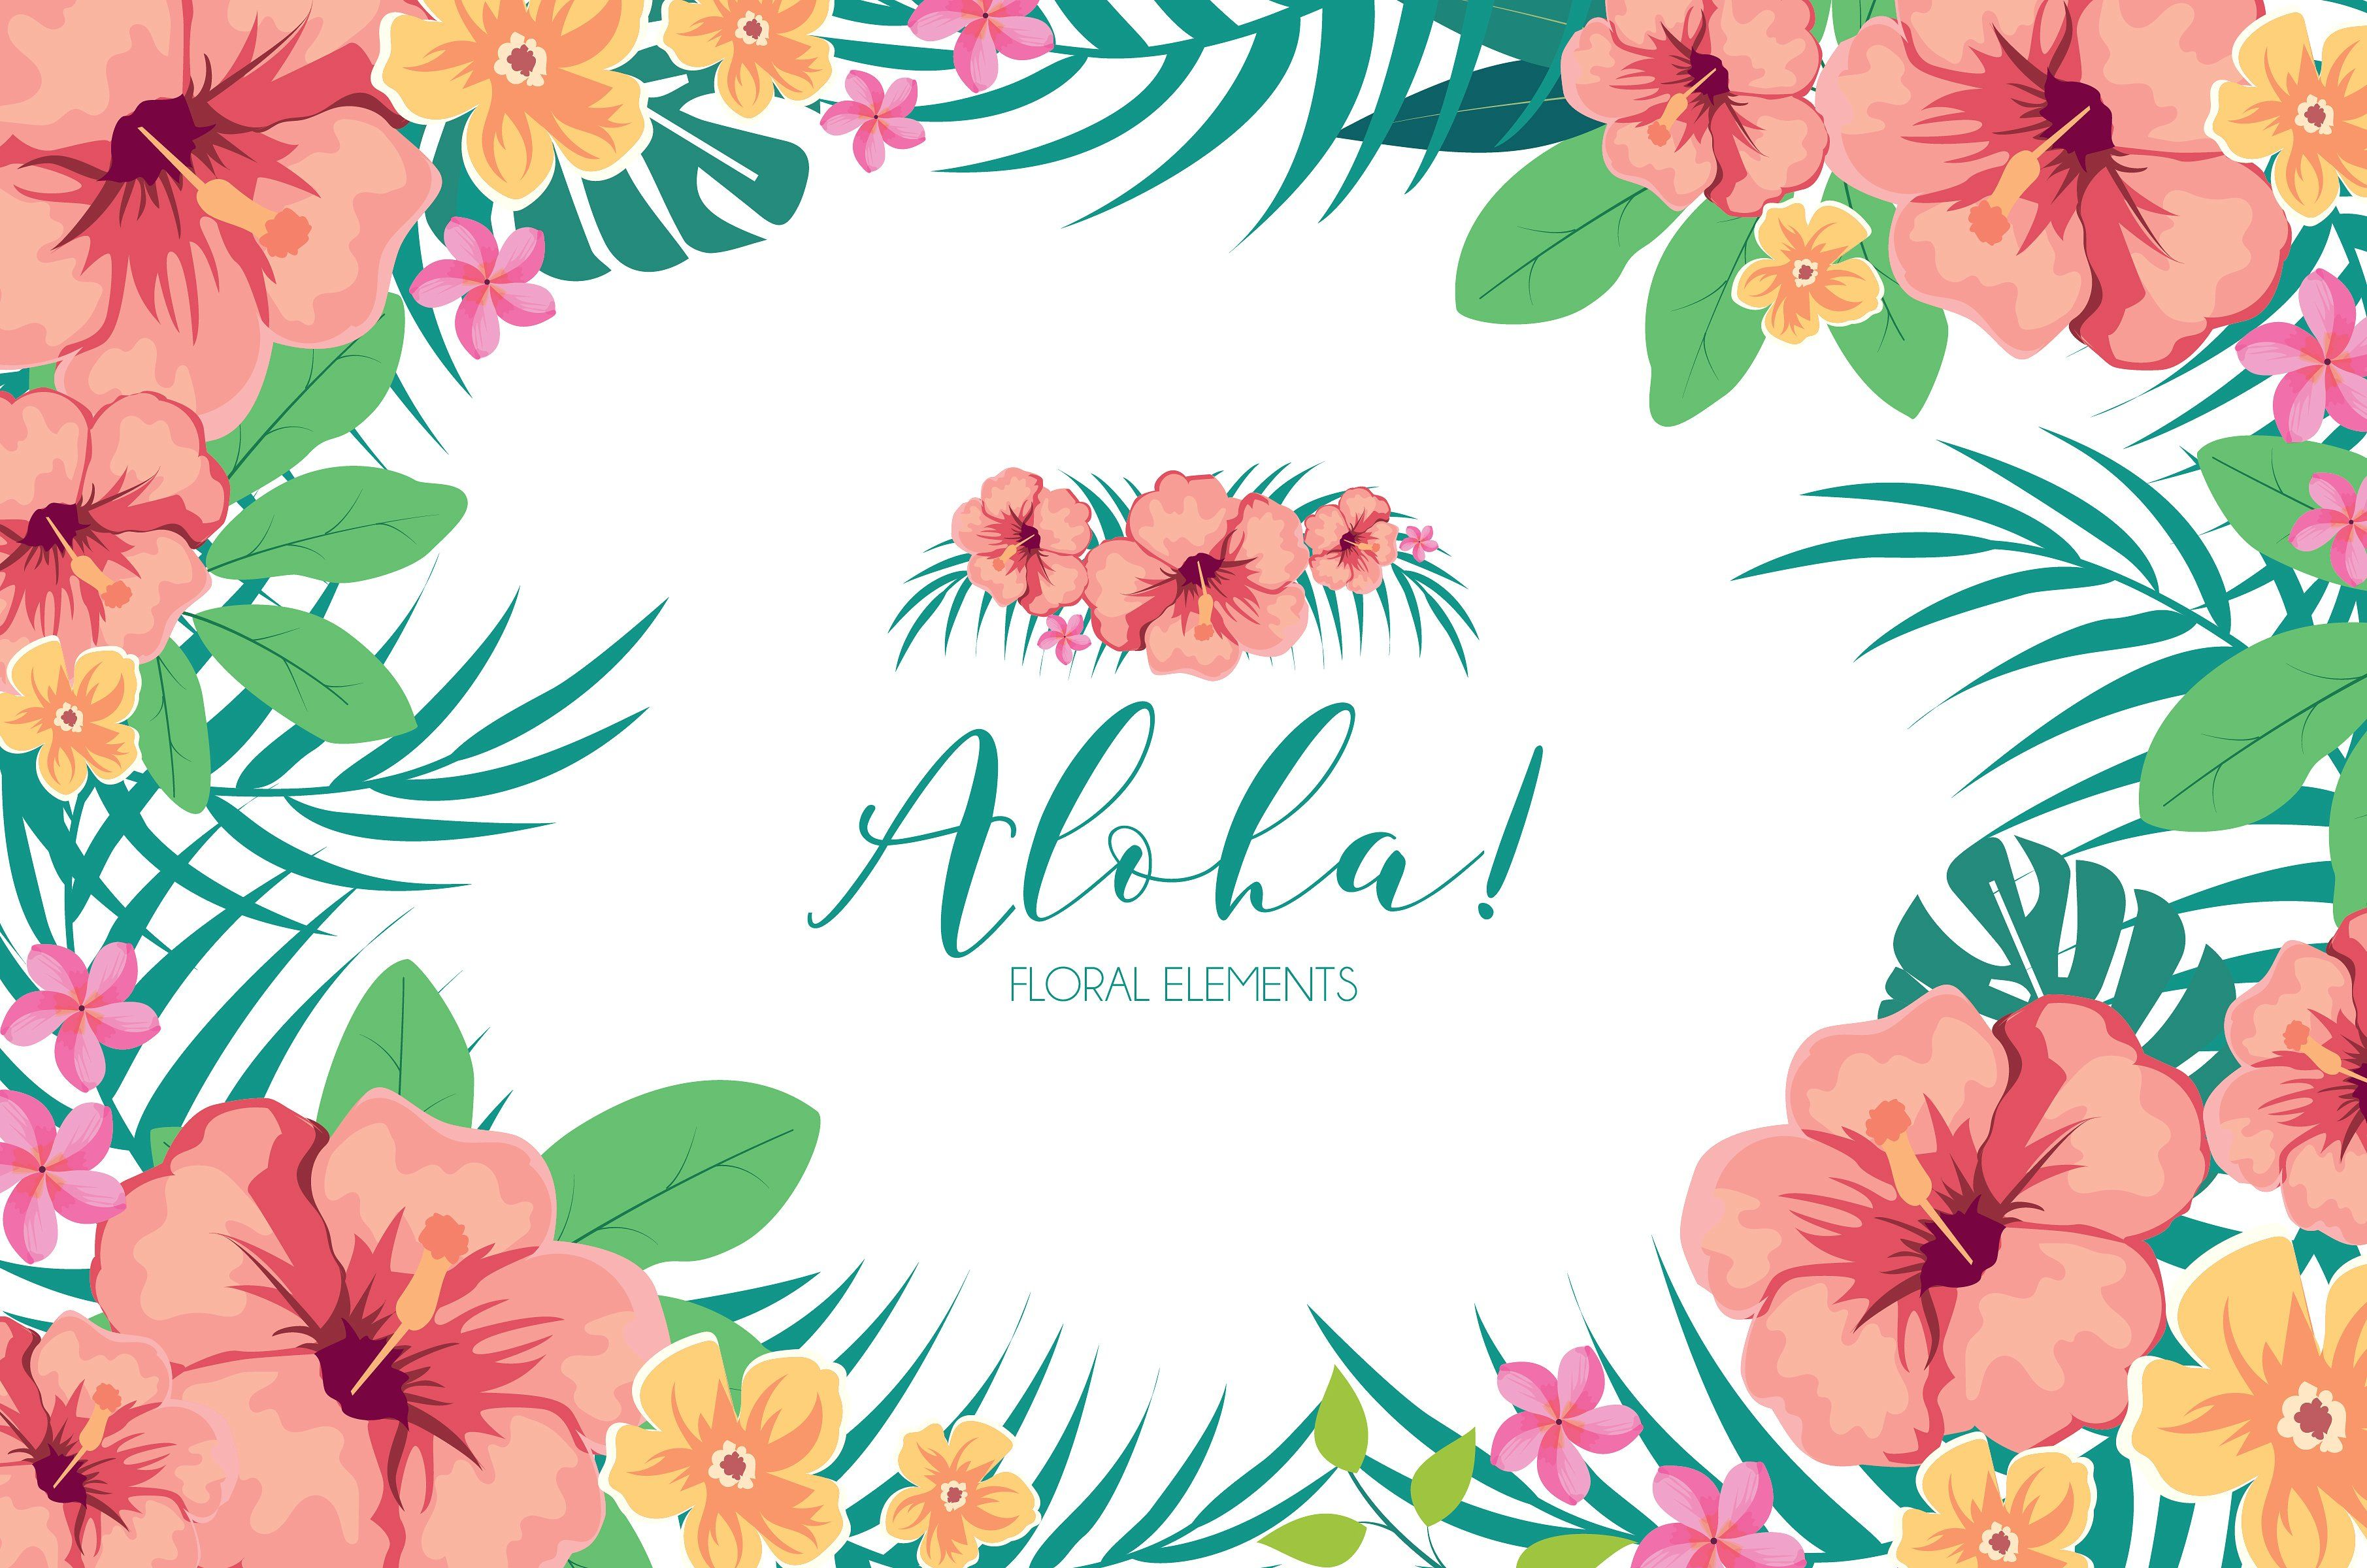 Tropical Hawaiian Flowers Clipart By Cutepaperstudio On Creativemarket